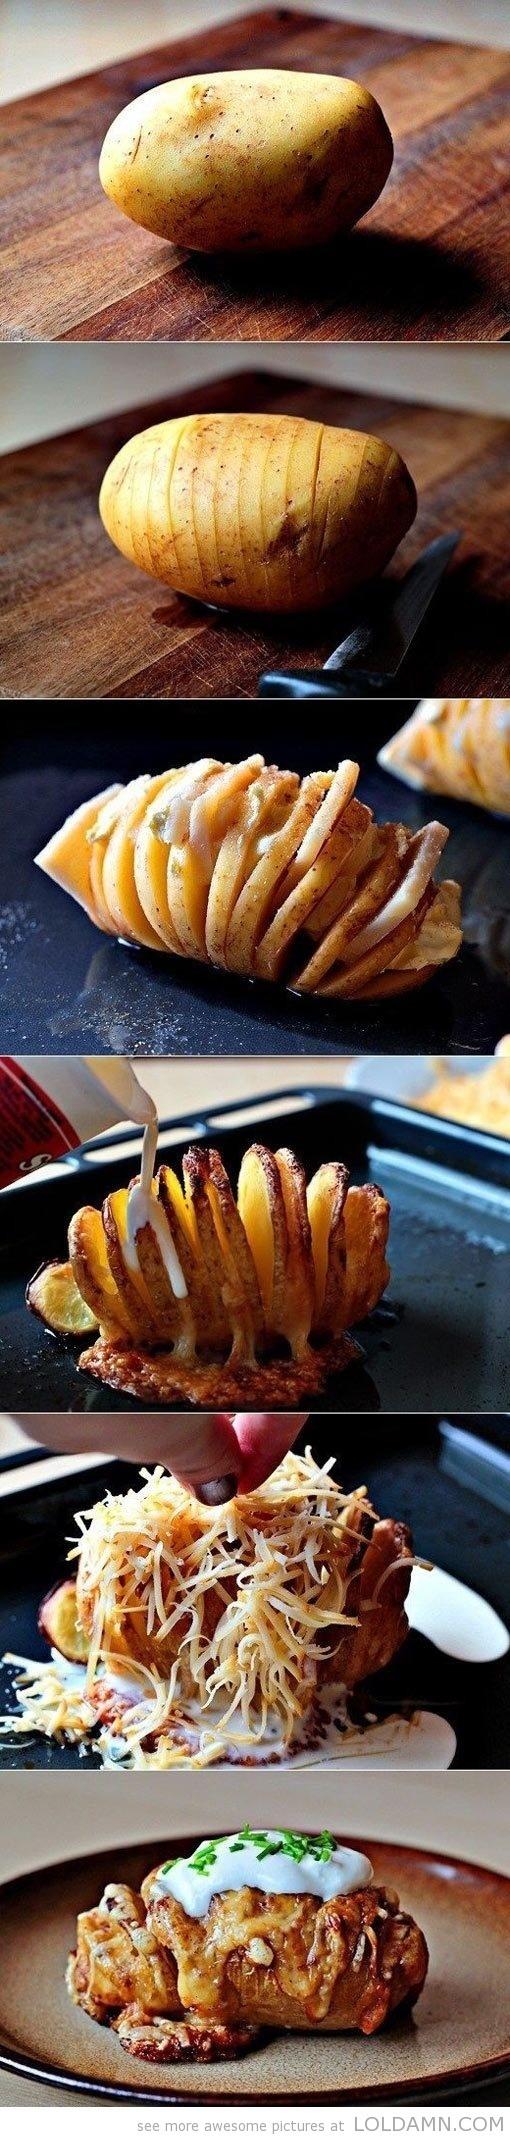 stuffed potatoes so delicious